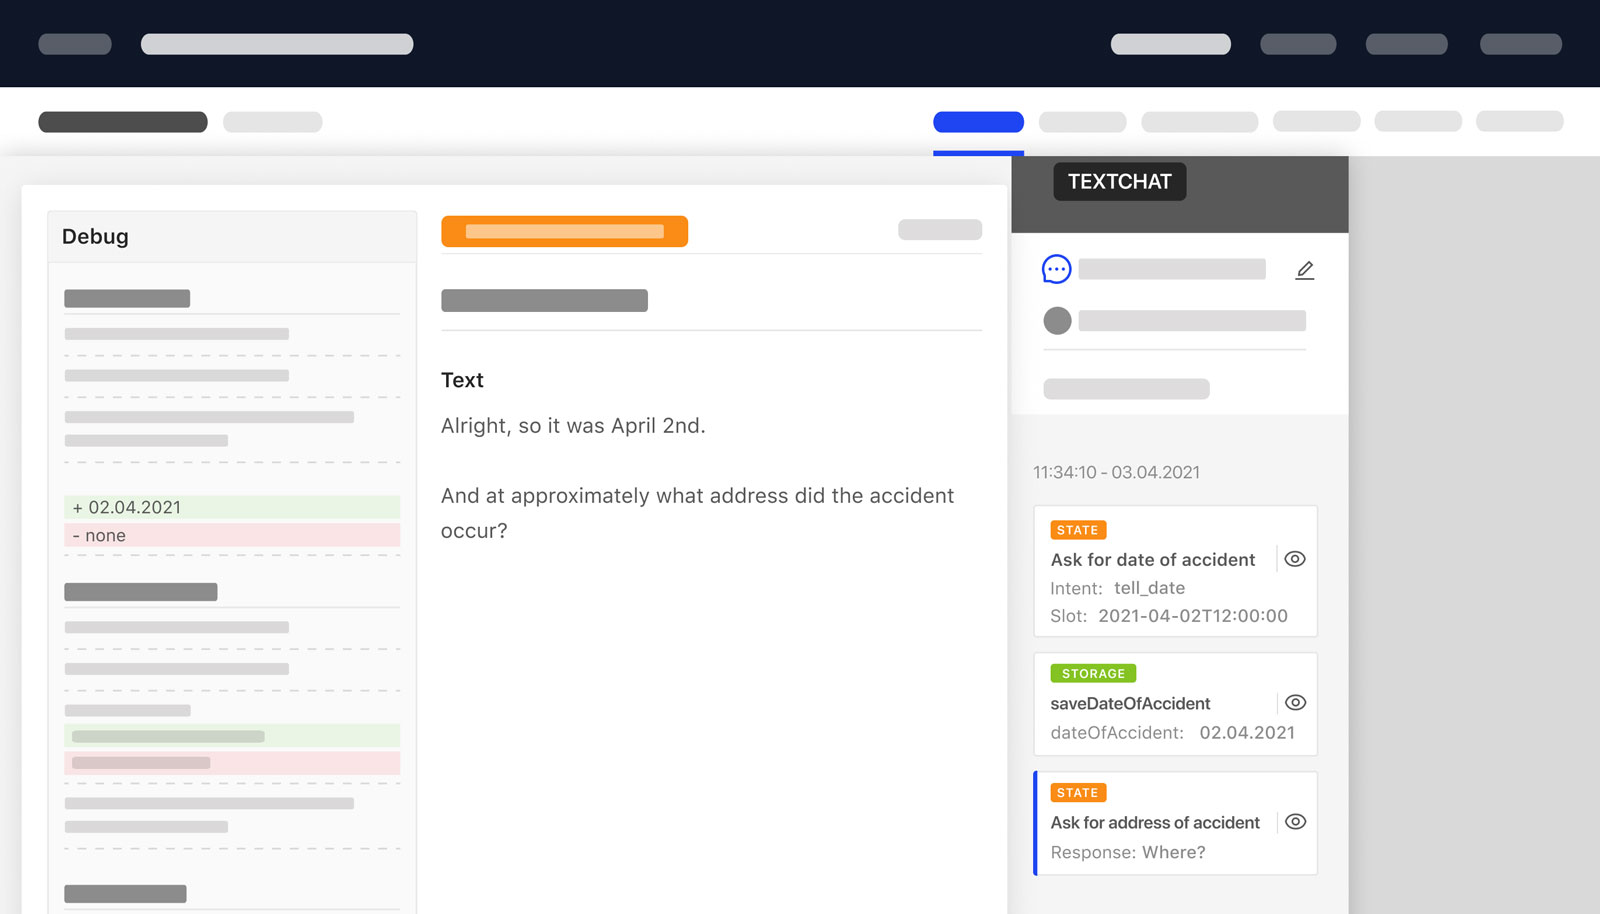 Debug Chat Chatbot Bot Test Prototype